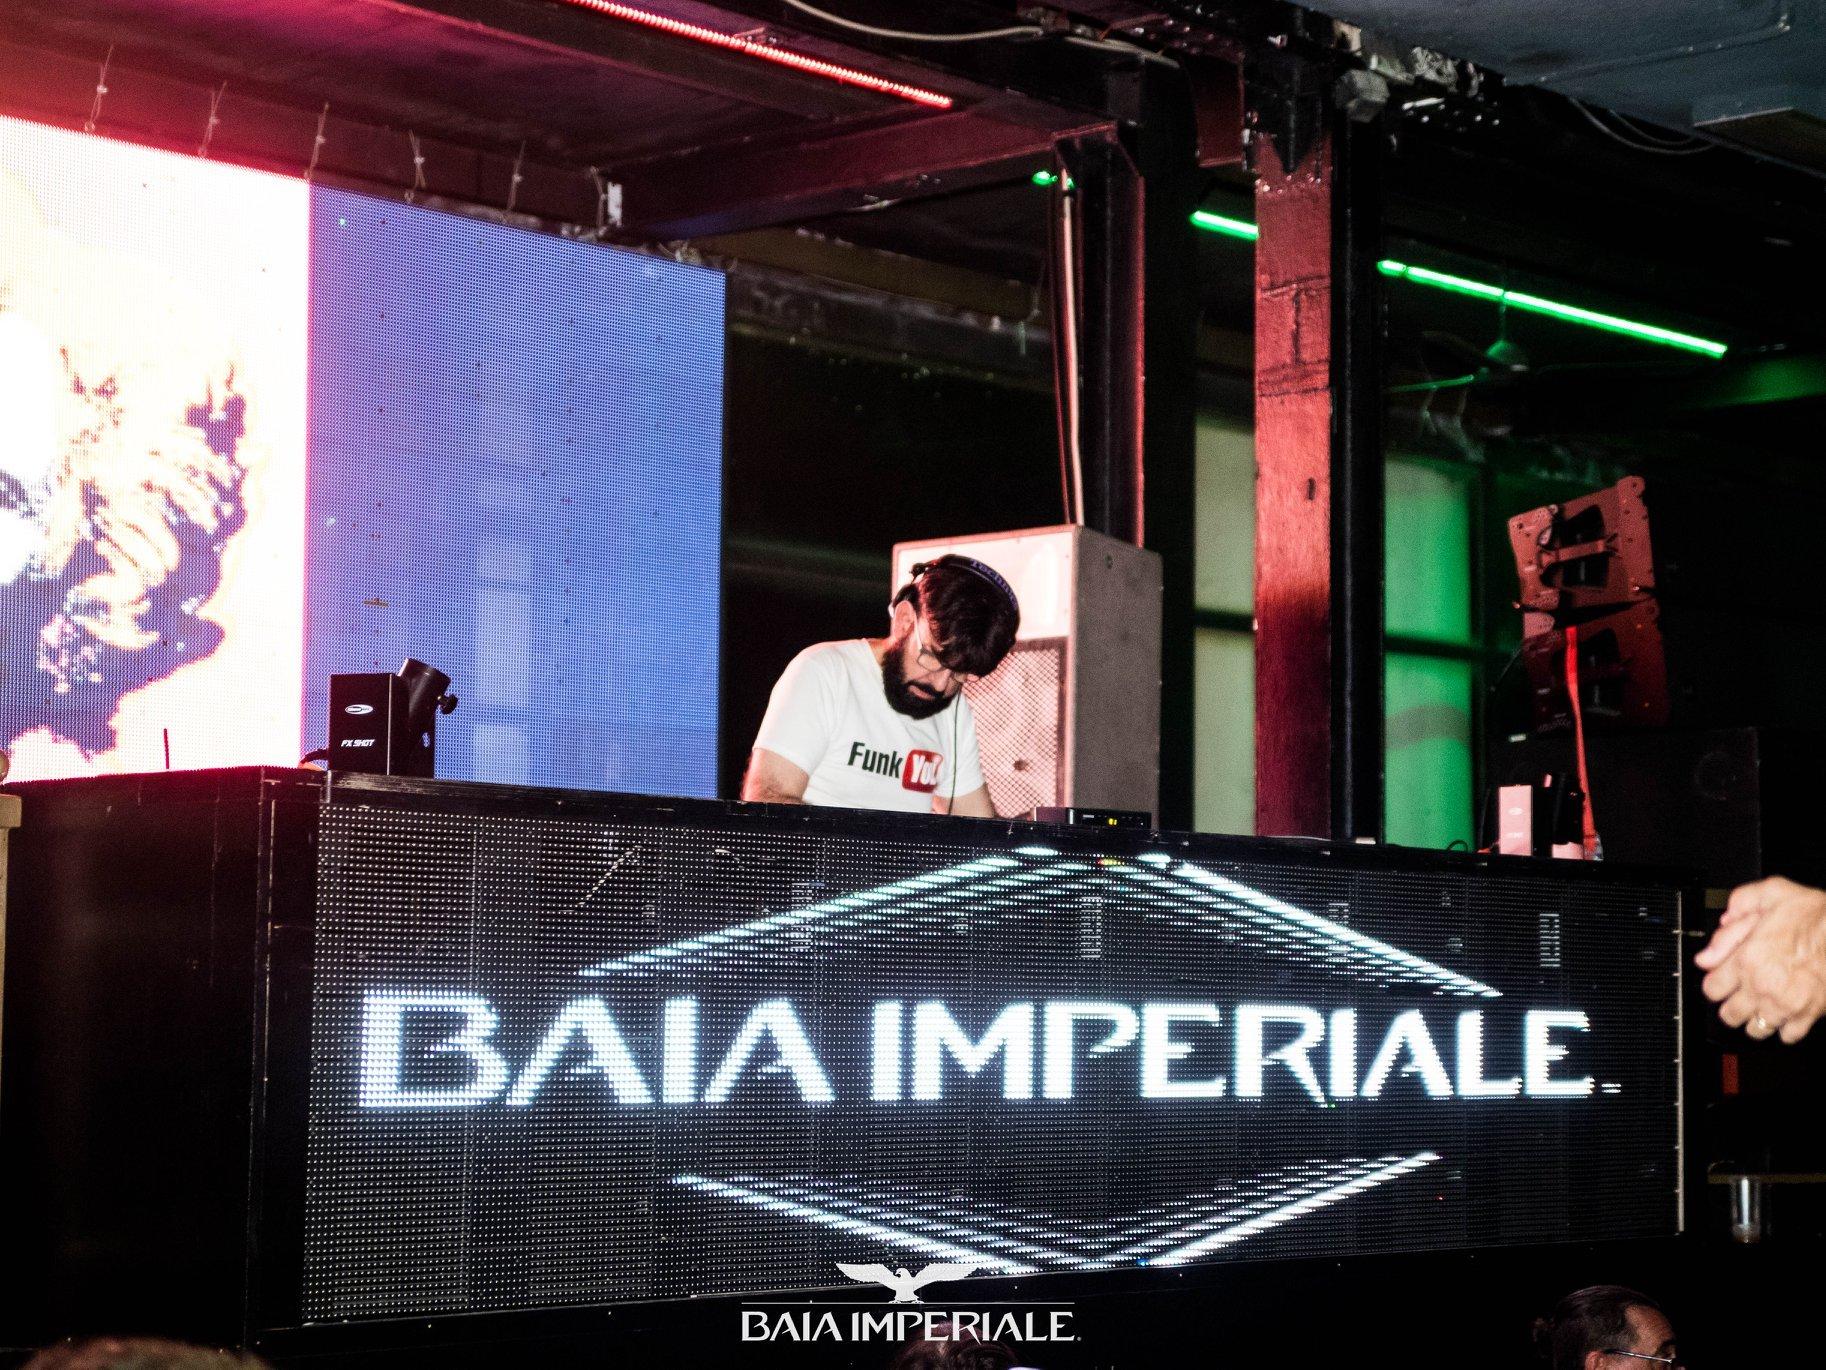 Arrivano le serate più calde alla Discoteca Baia Imperiale di Gabicce